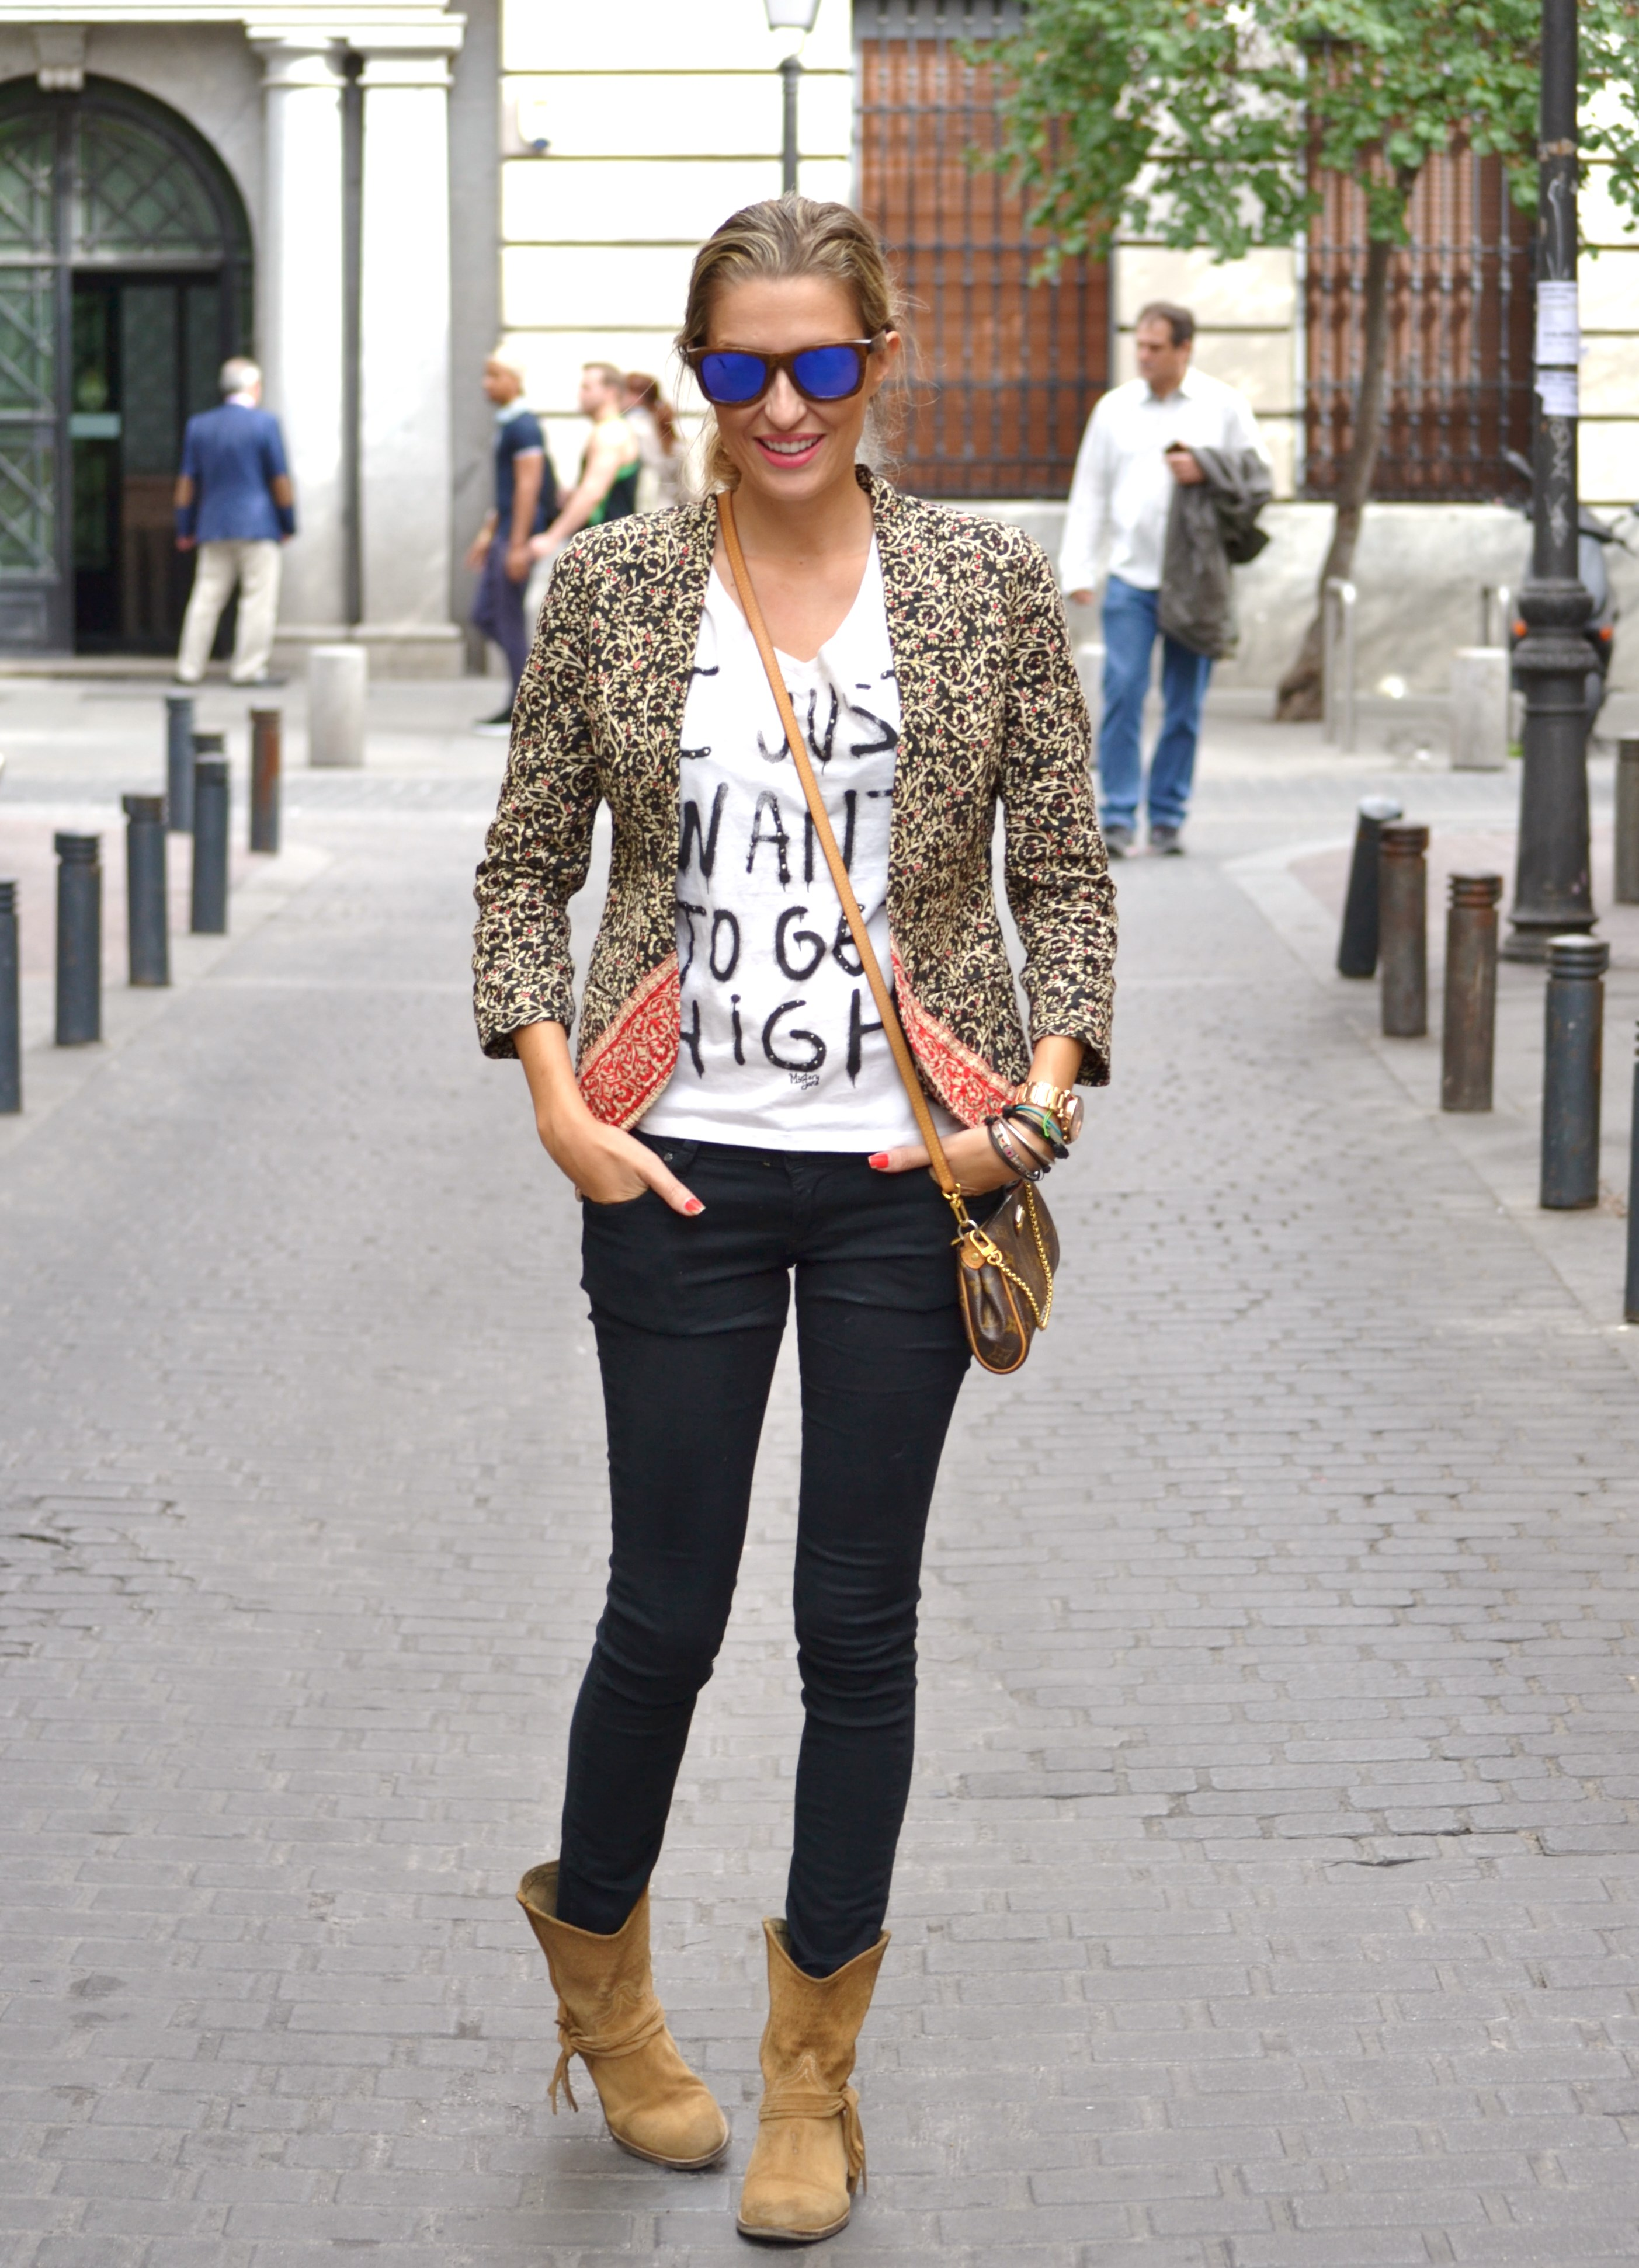 Karimba_Sunglasses_Mango_Skinny_Jeans_Alpe_Boots_Louis_Vuitton_Lara_Martin_Gilarranz_Bymyheels (4)